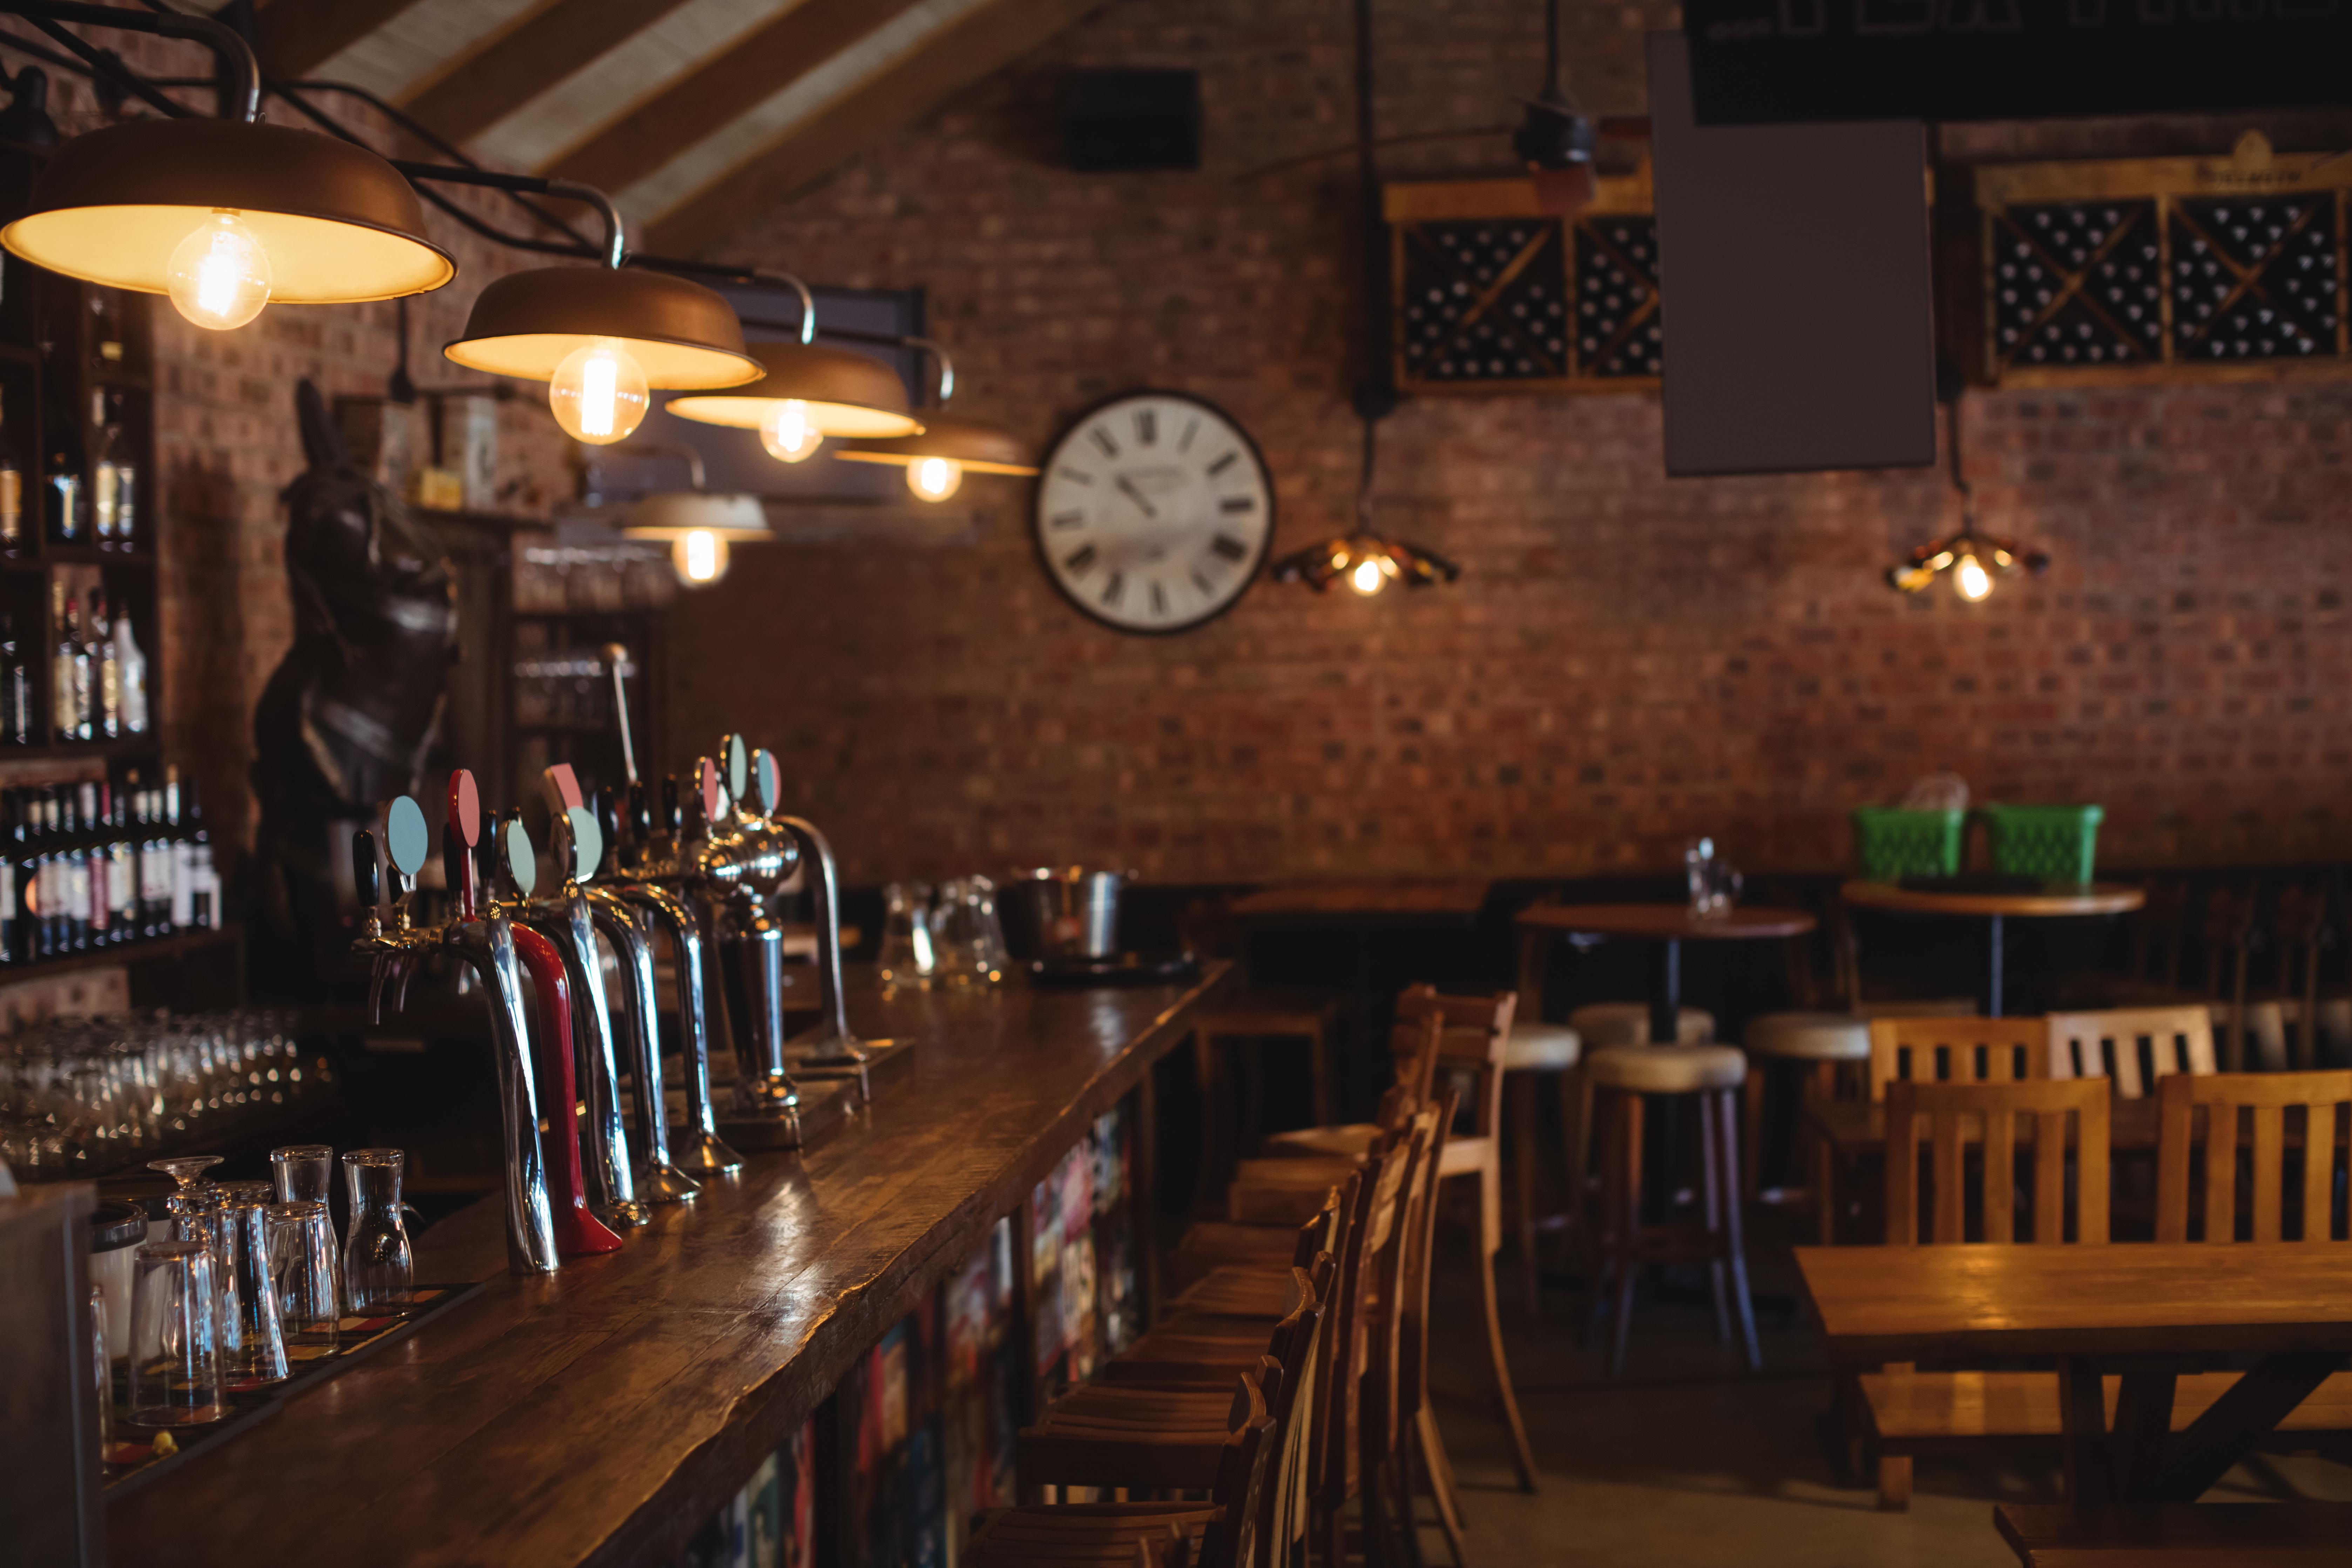 bar-counter-at-pub-DSLQ69G-1